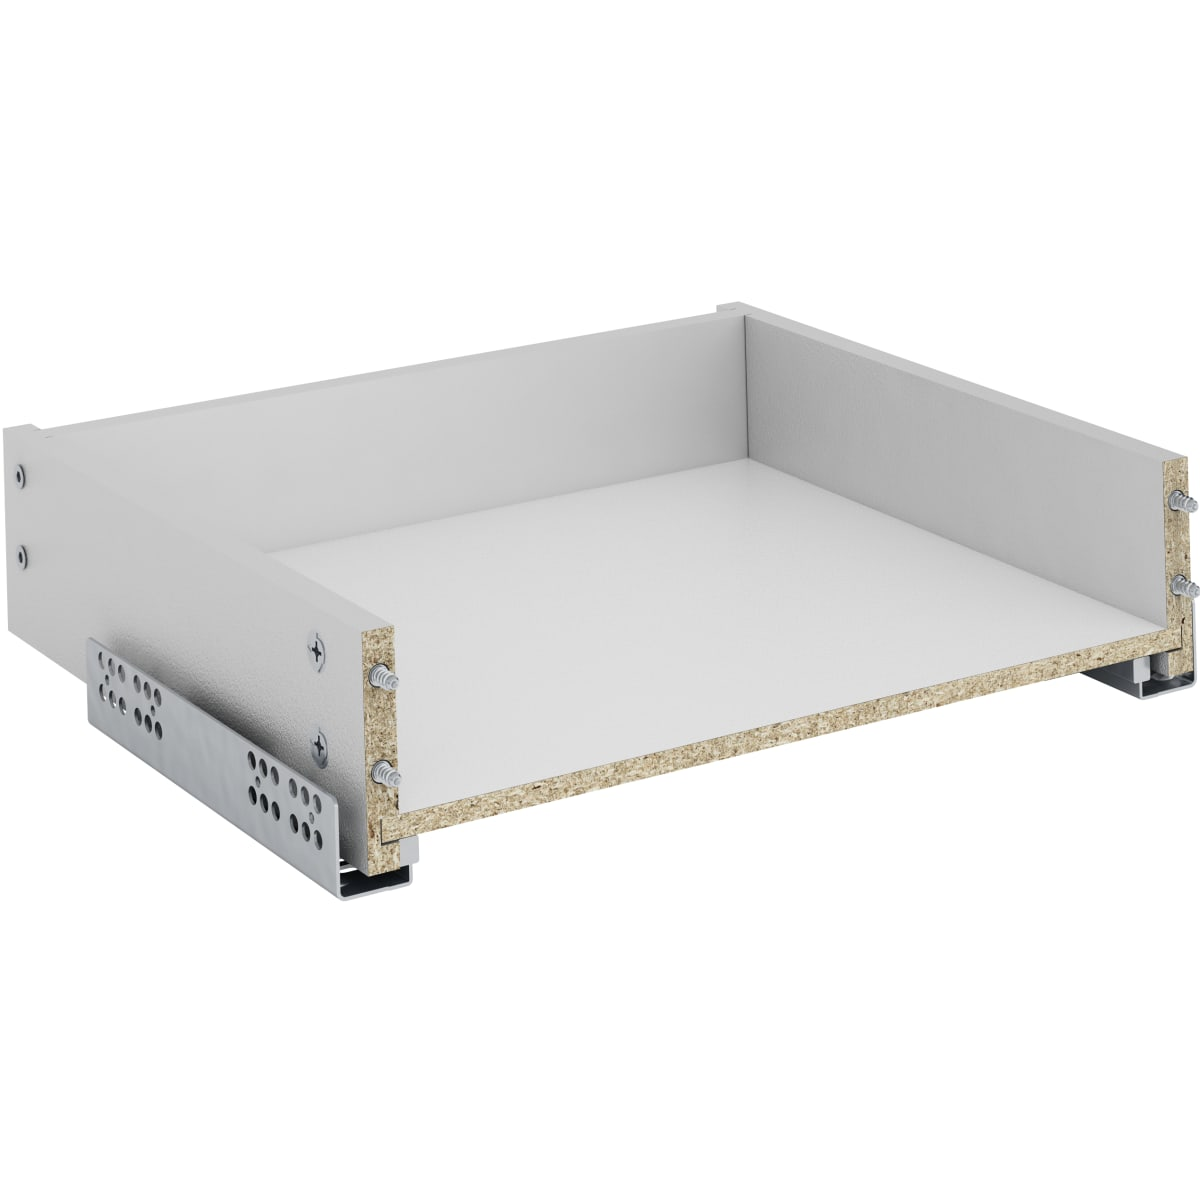 Ящик для навесного каркаса Delinia 35.2x8.1x31.1 см, ЛДСП